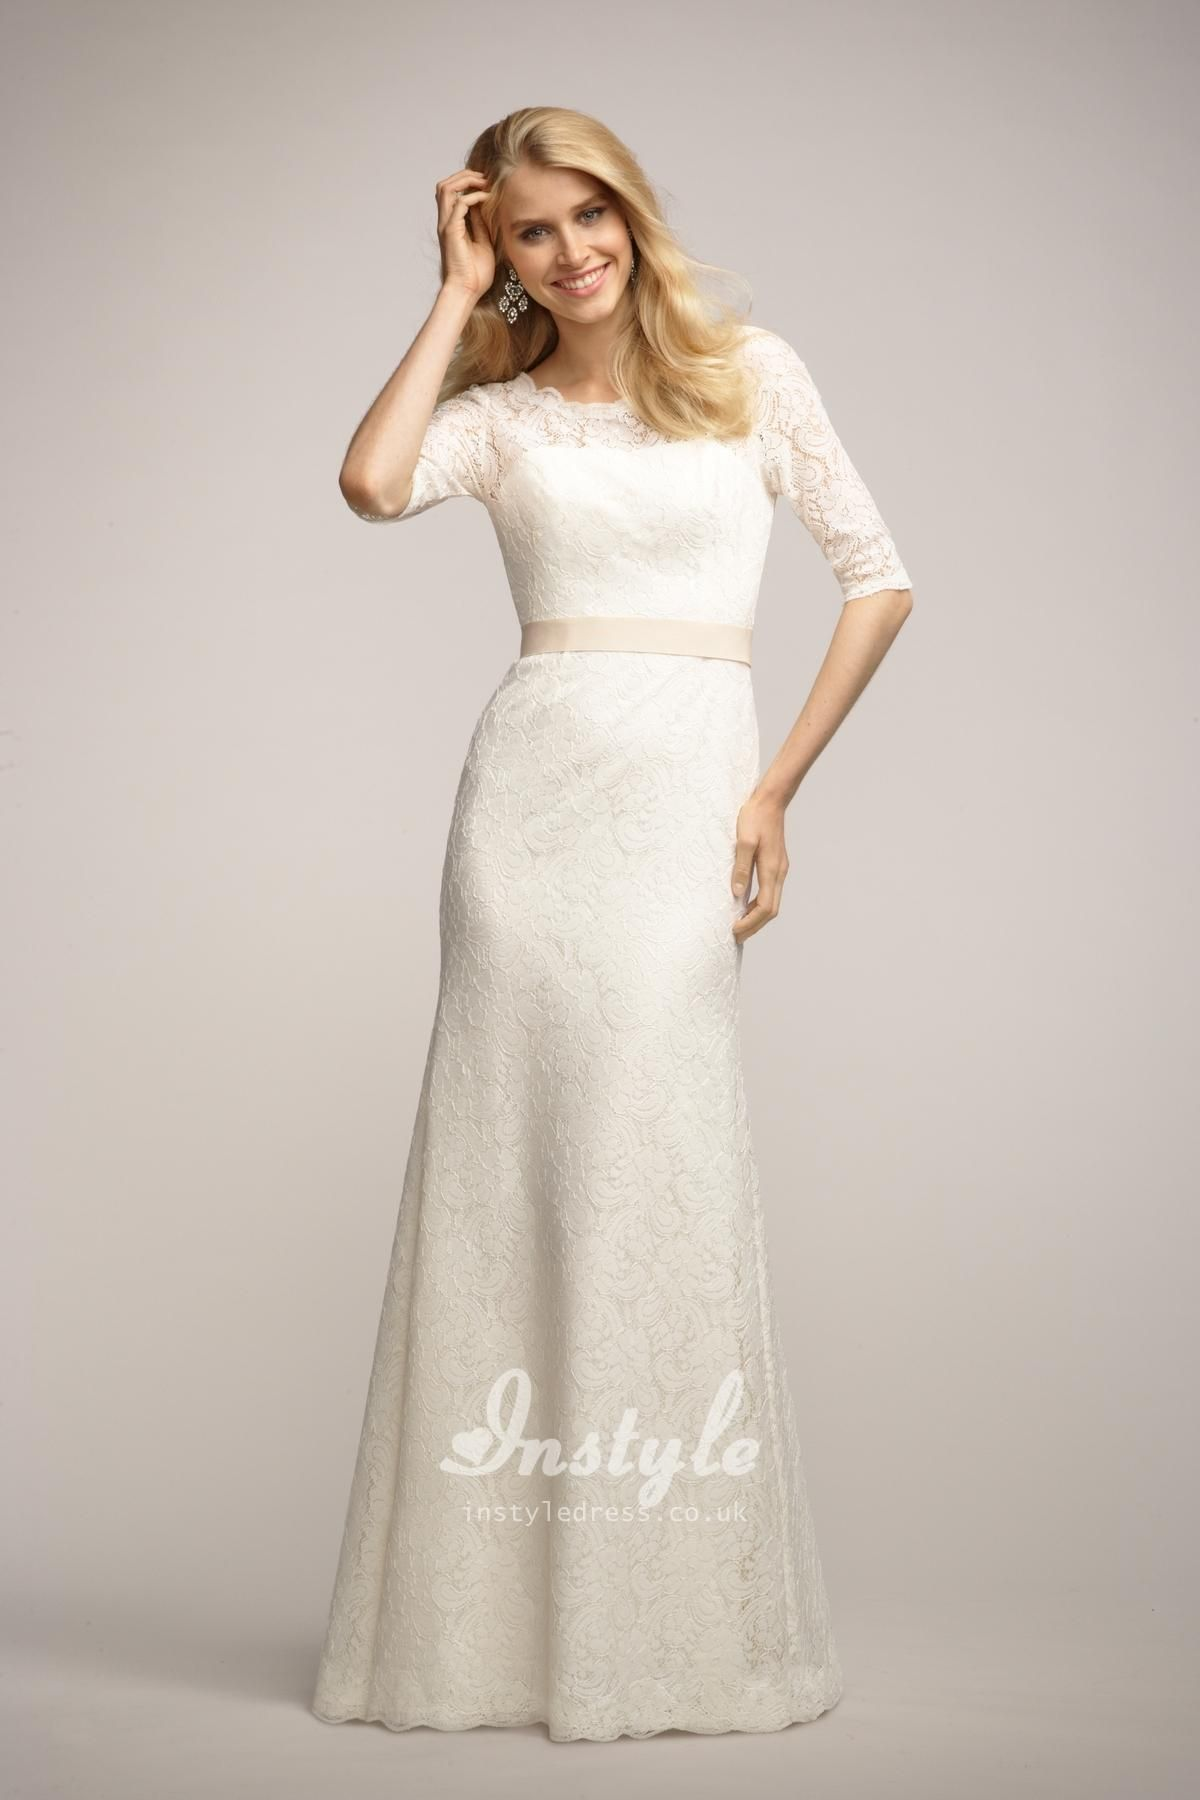 Boat Neck Ivory Lace Long Bridesmaid Dress Uk With 3 4 Length